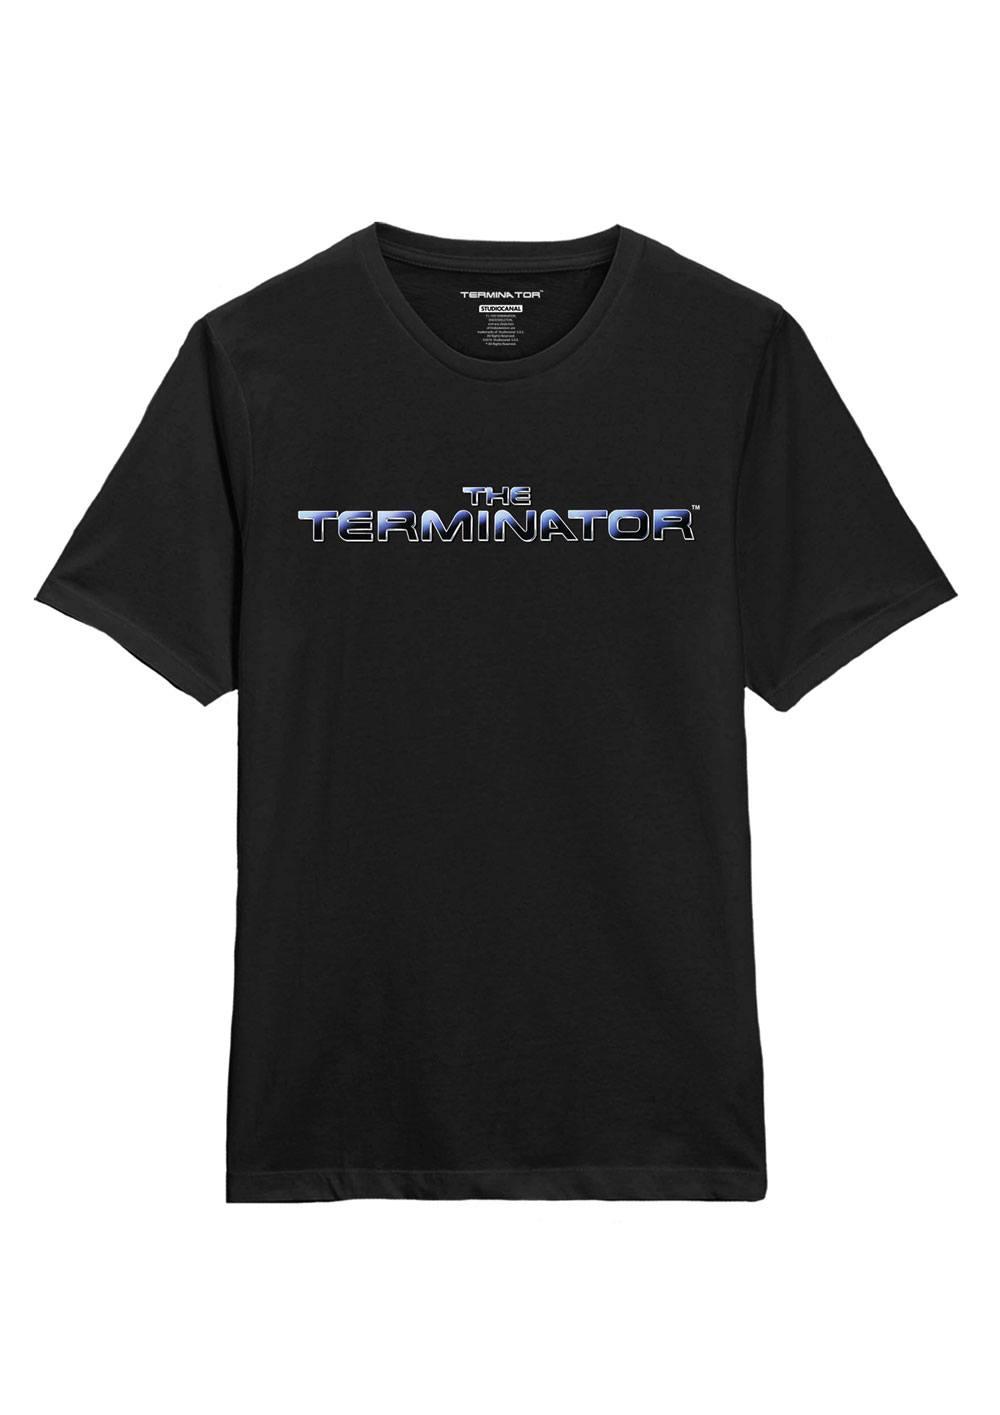 Terminator T-Shirt Logo Size L